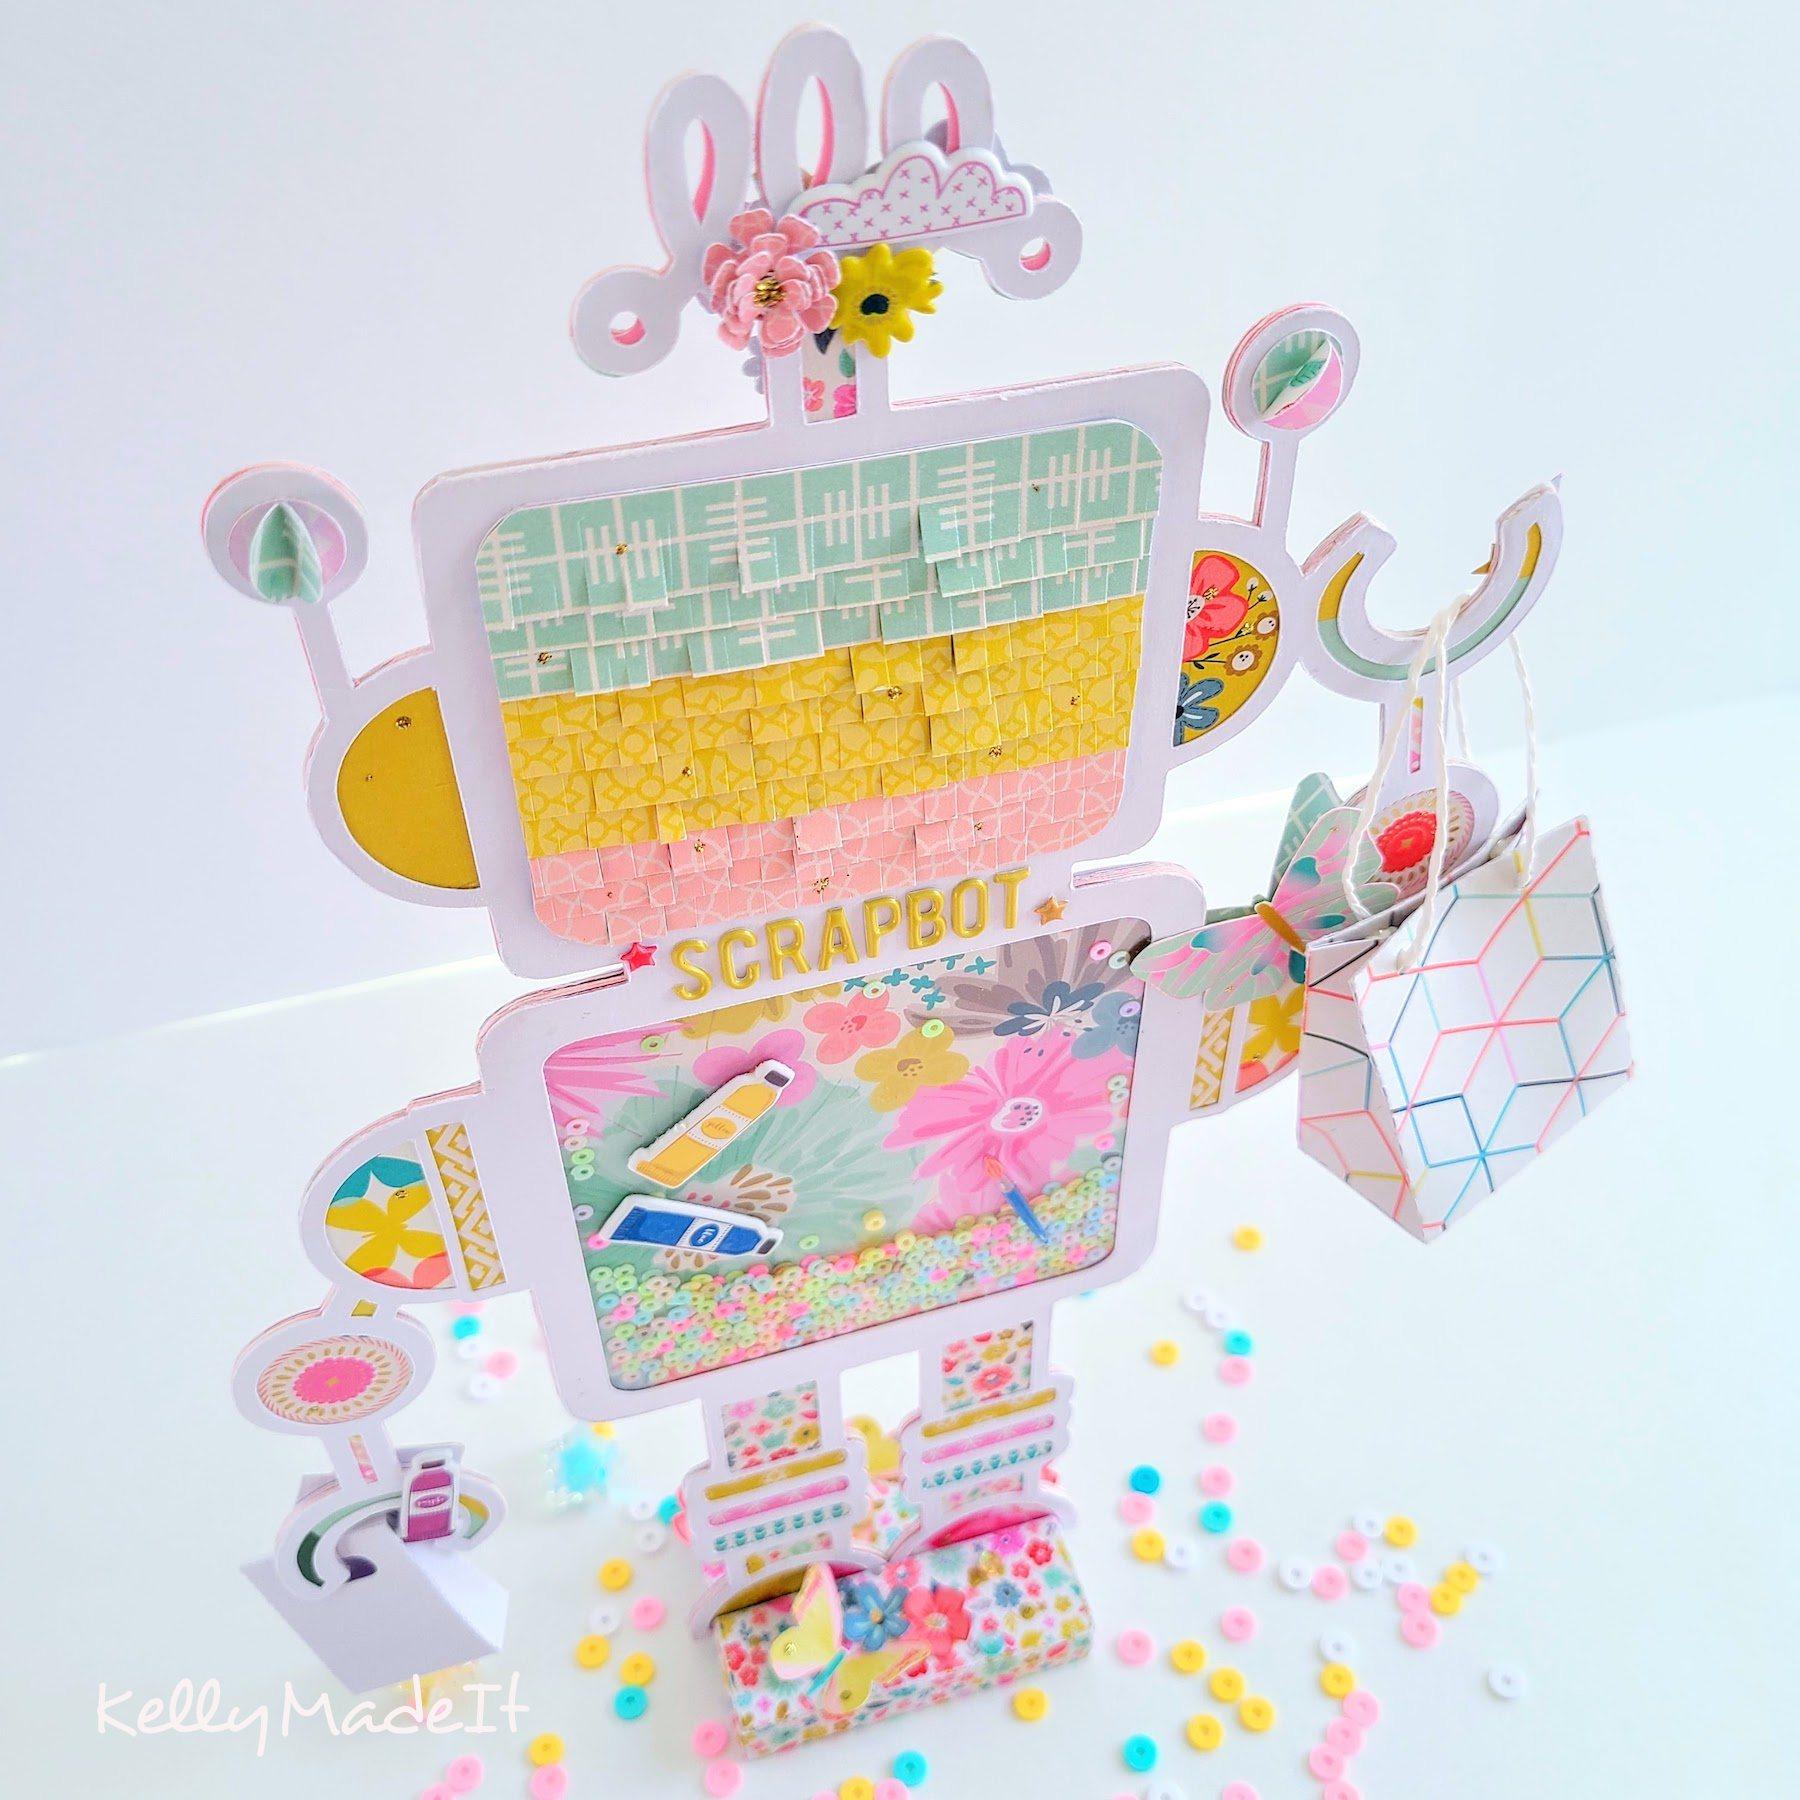 KellyMadeIt Robot Mini Album 2